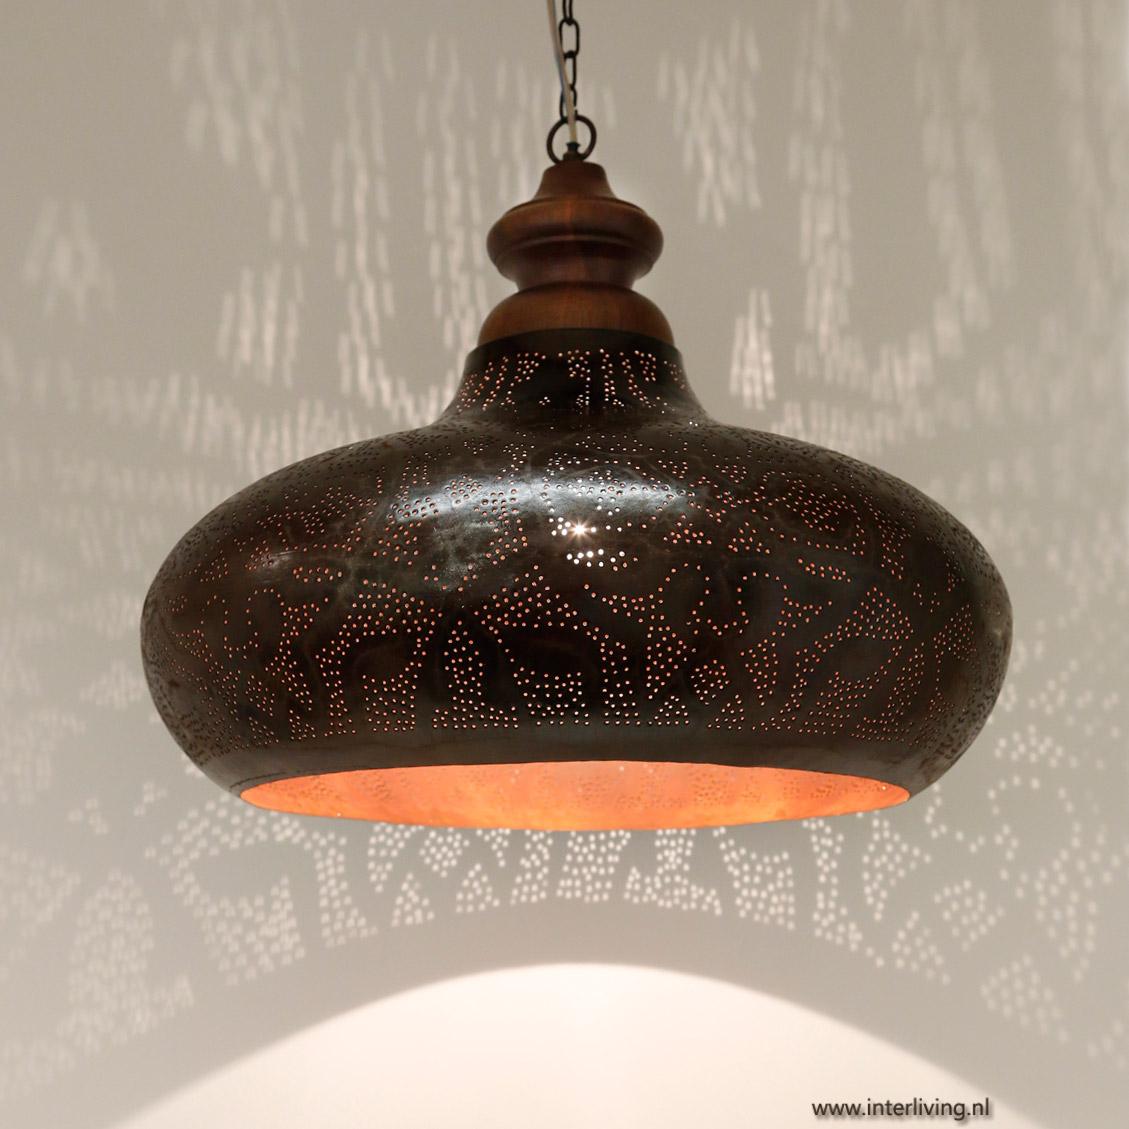 Industriële hanglamp met oosterse twist en hout   roest,zwart,goud